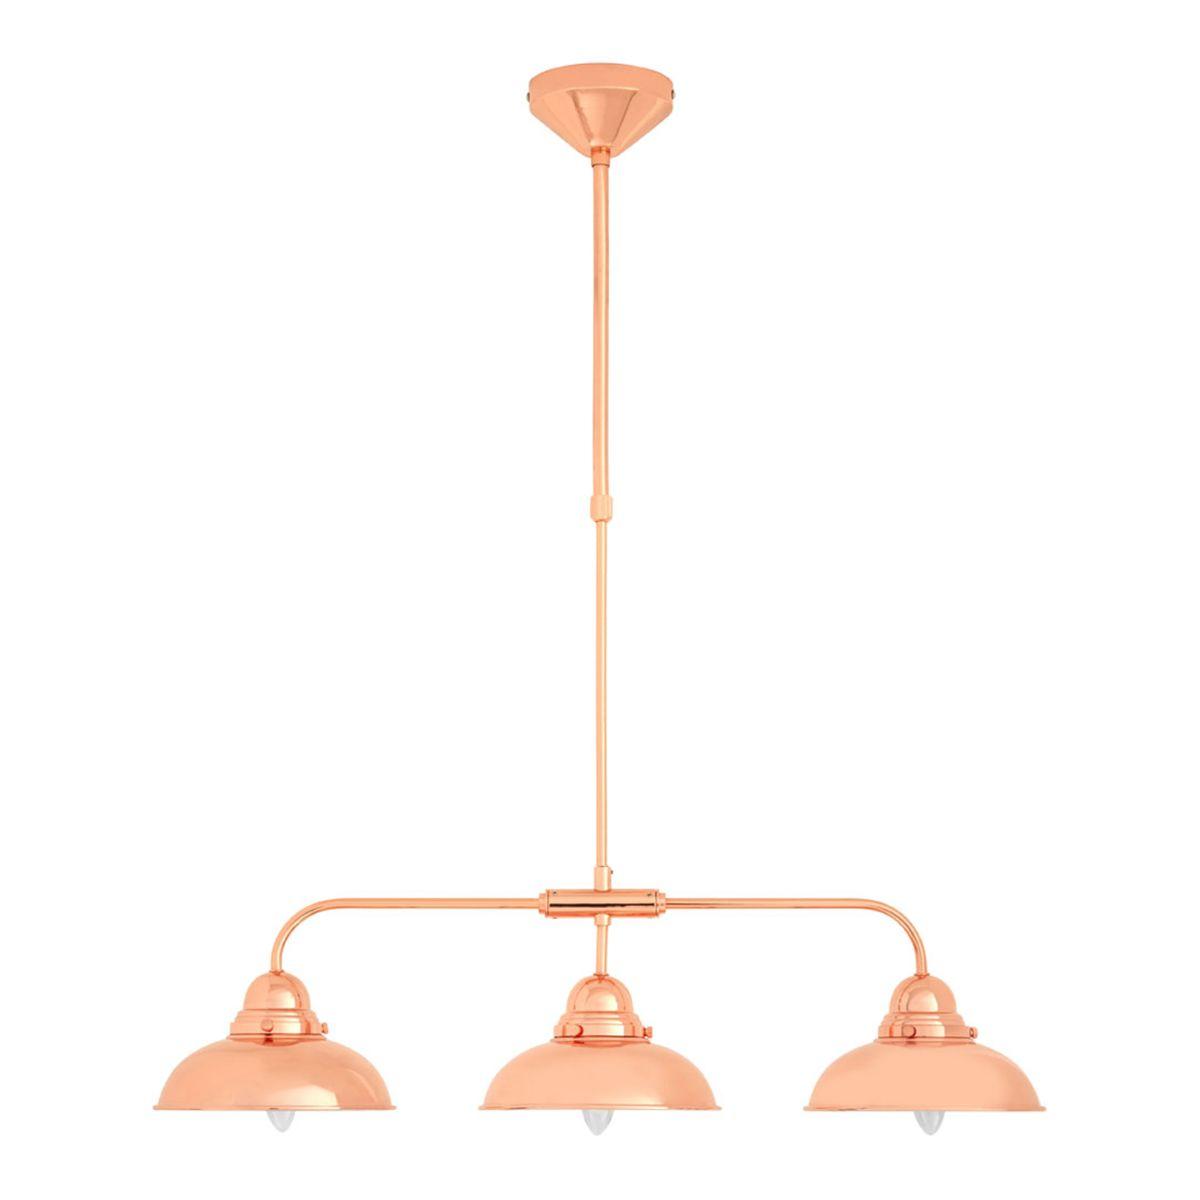 Premier Housewares Jasper Pendant Light 1 Beam 3 Shades - Copper Finish